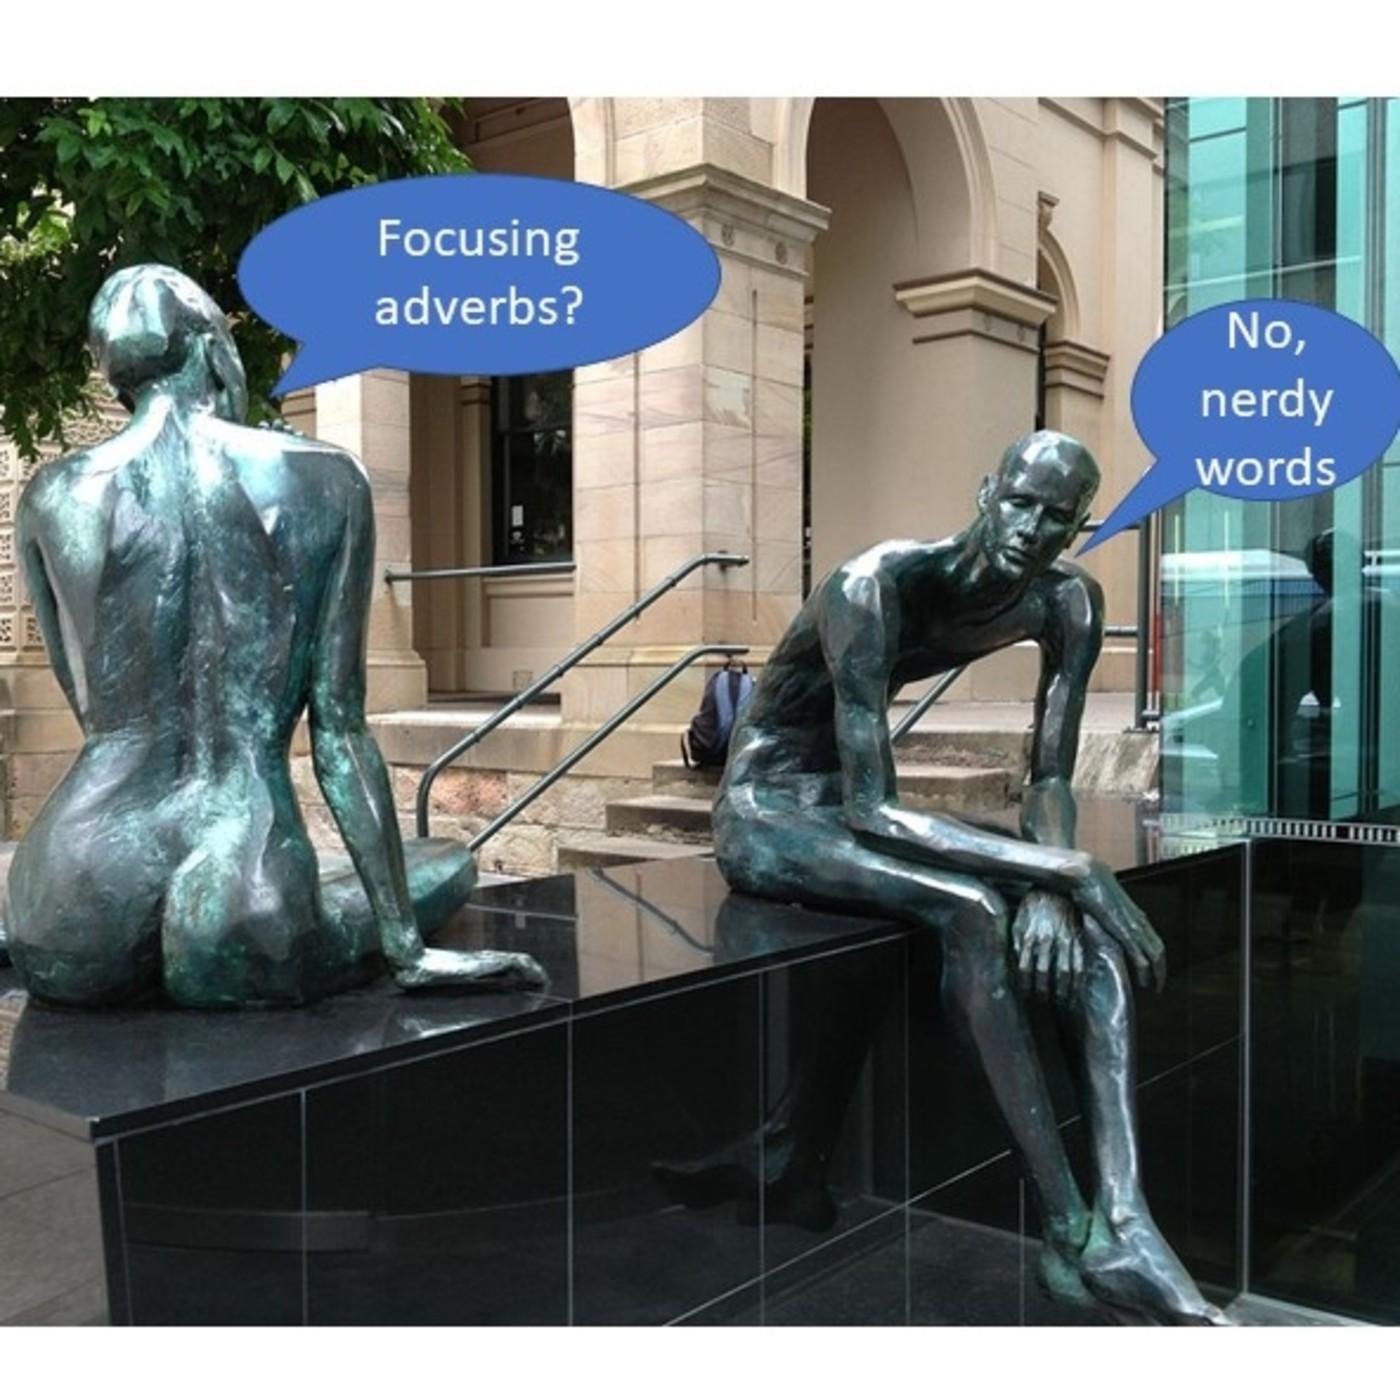 E3: Focusing adverbs & nerdy words